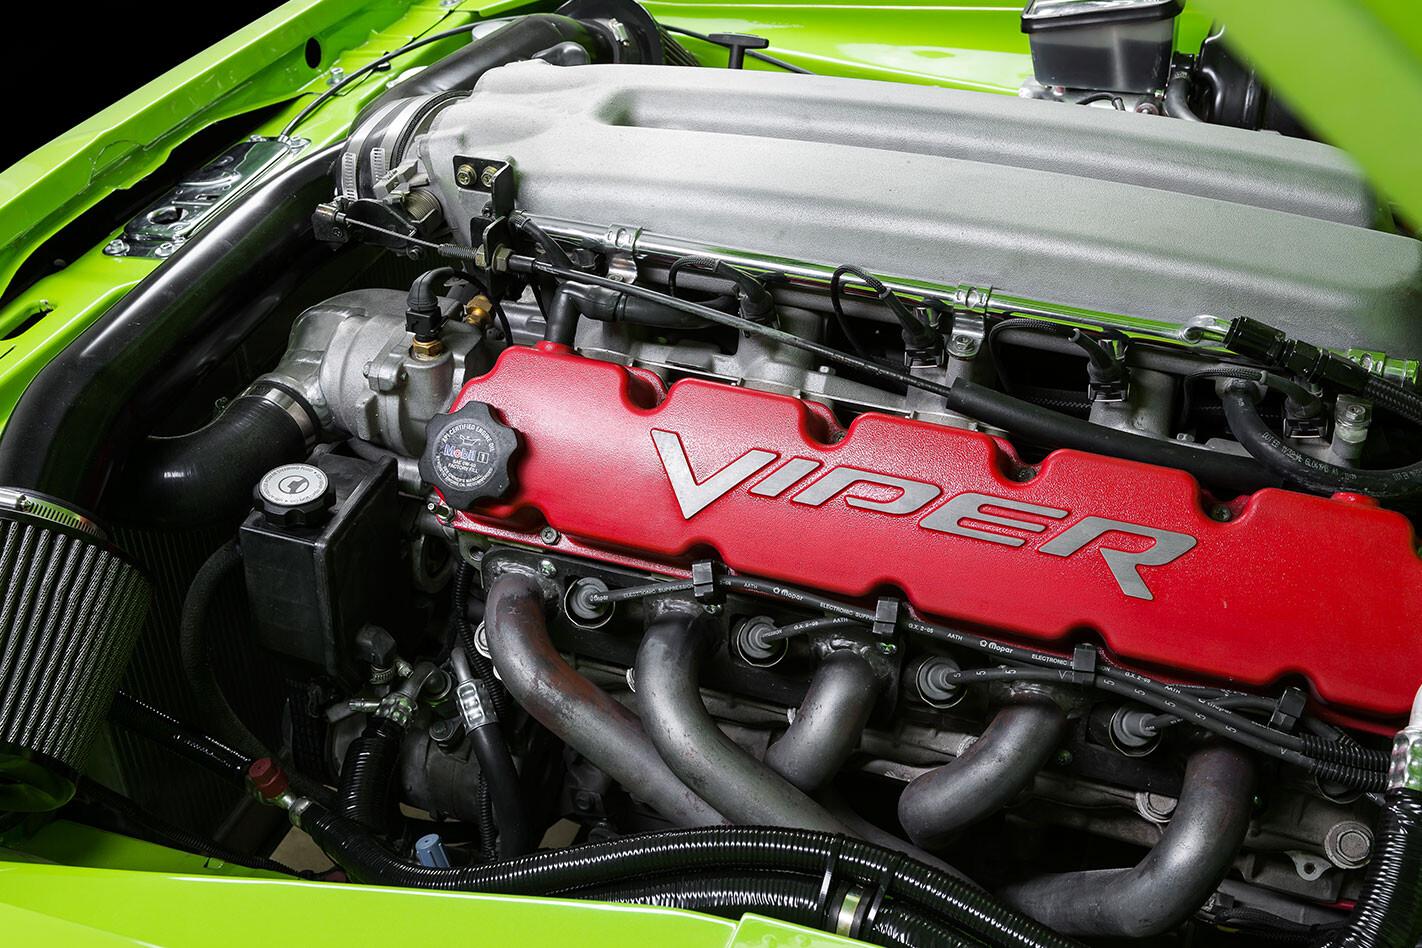 Viper 10 engine